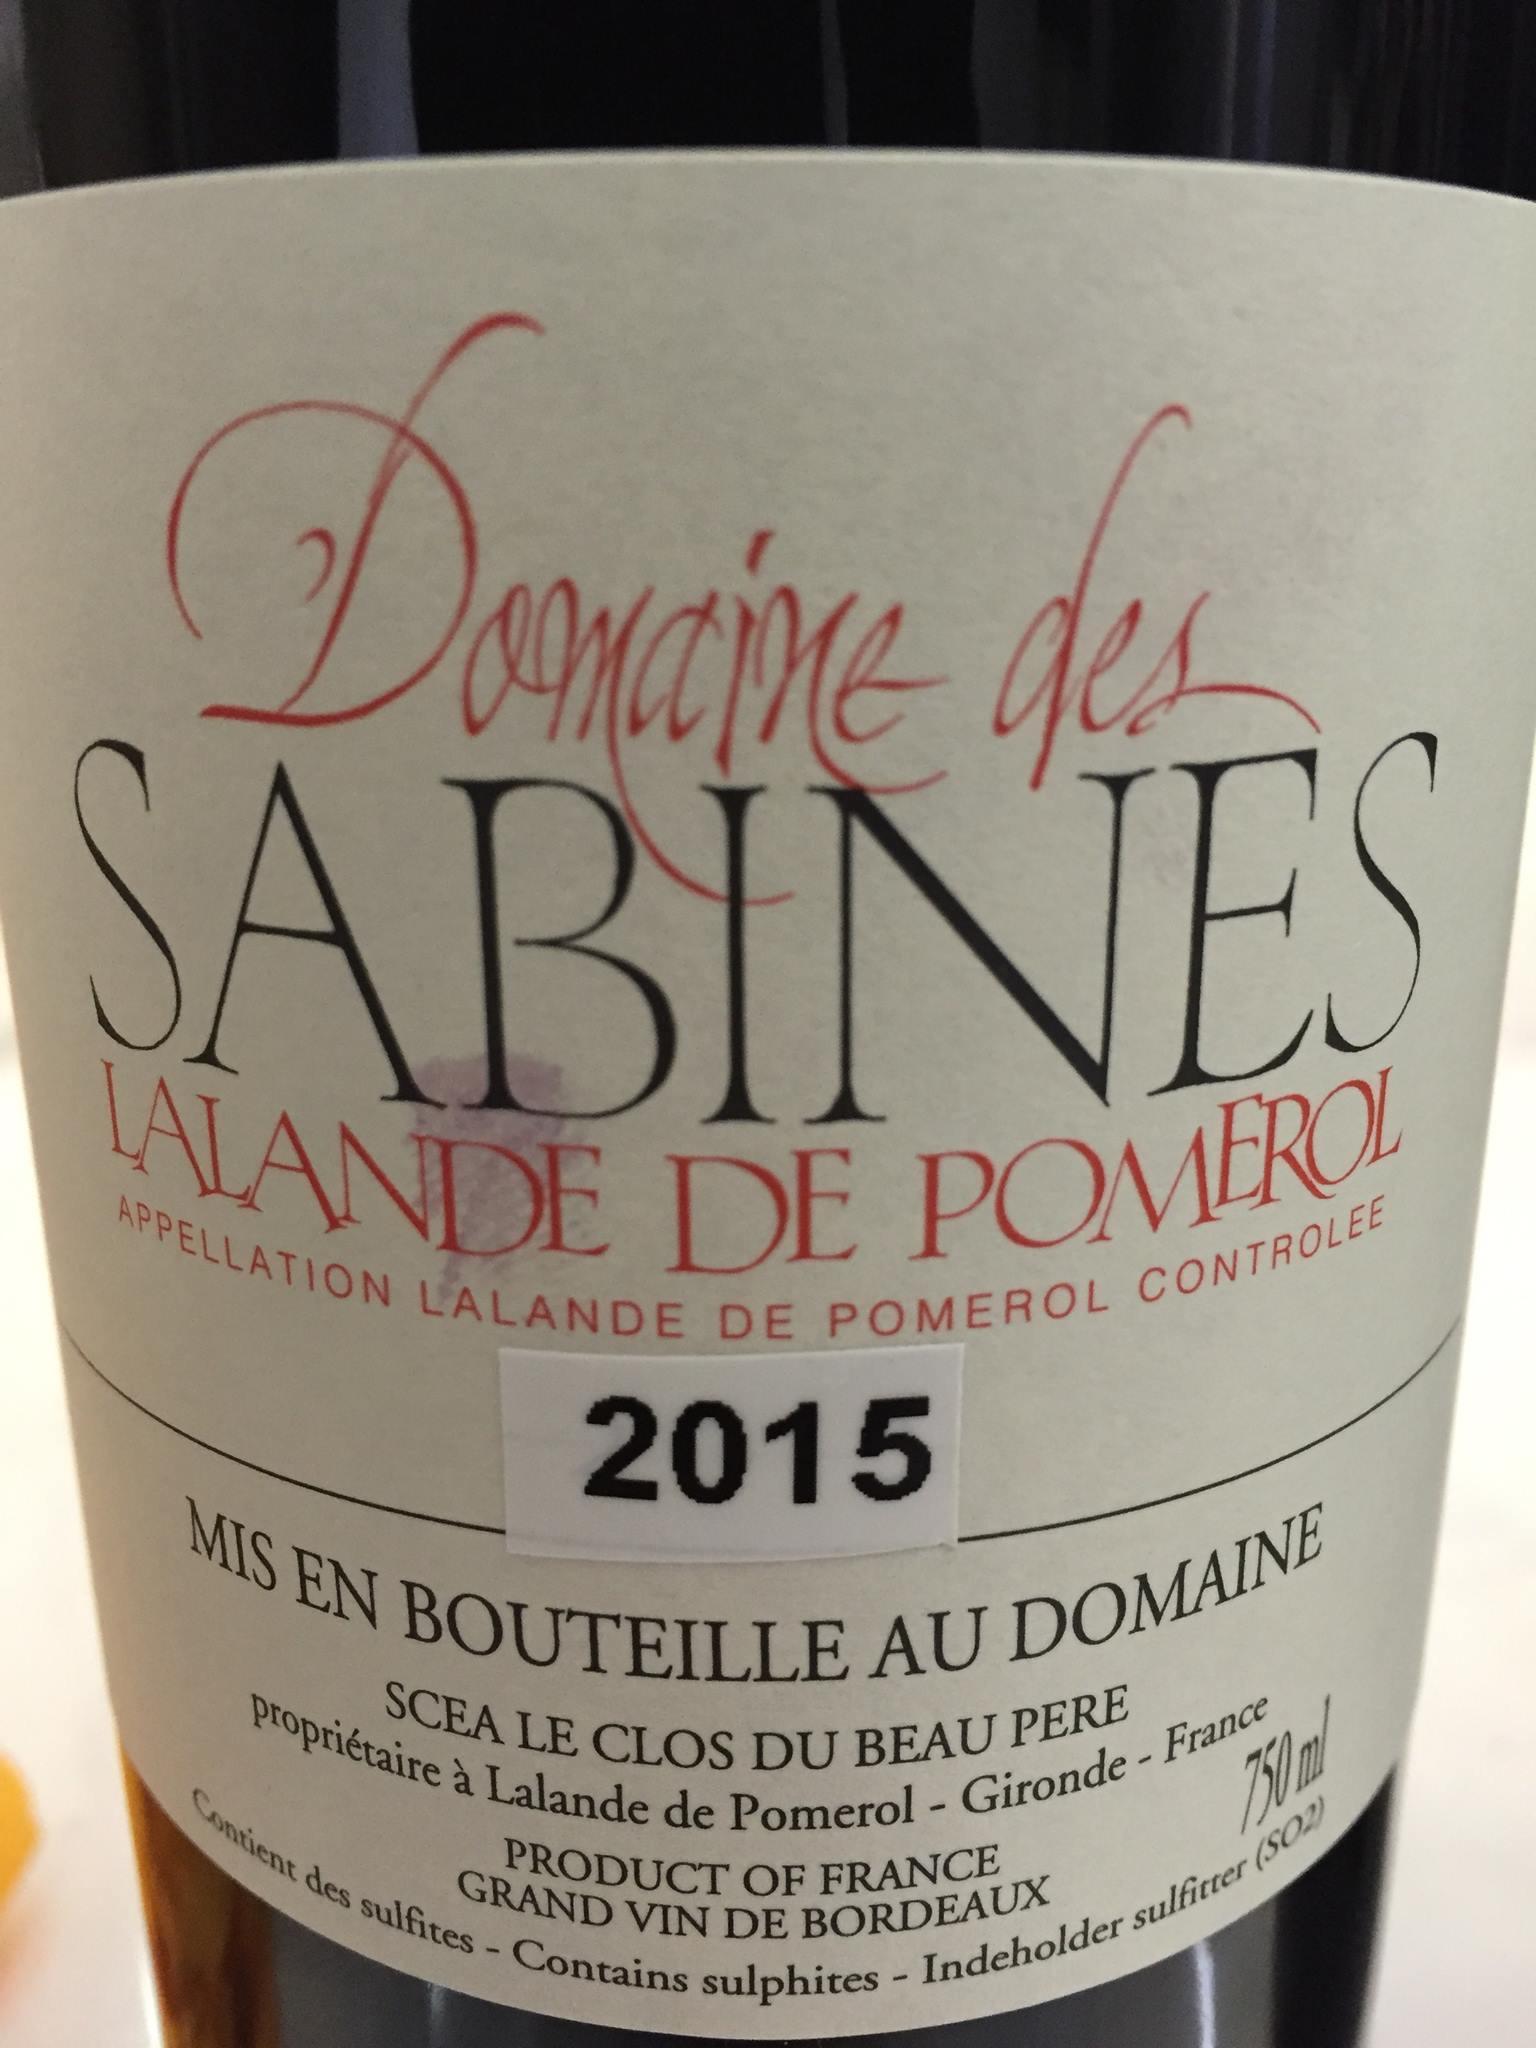 Domaine des Sabines 2015 – Lalande de Pomerol